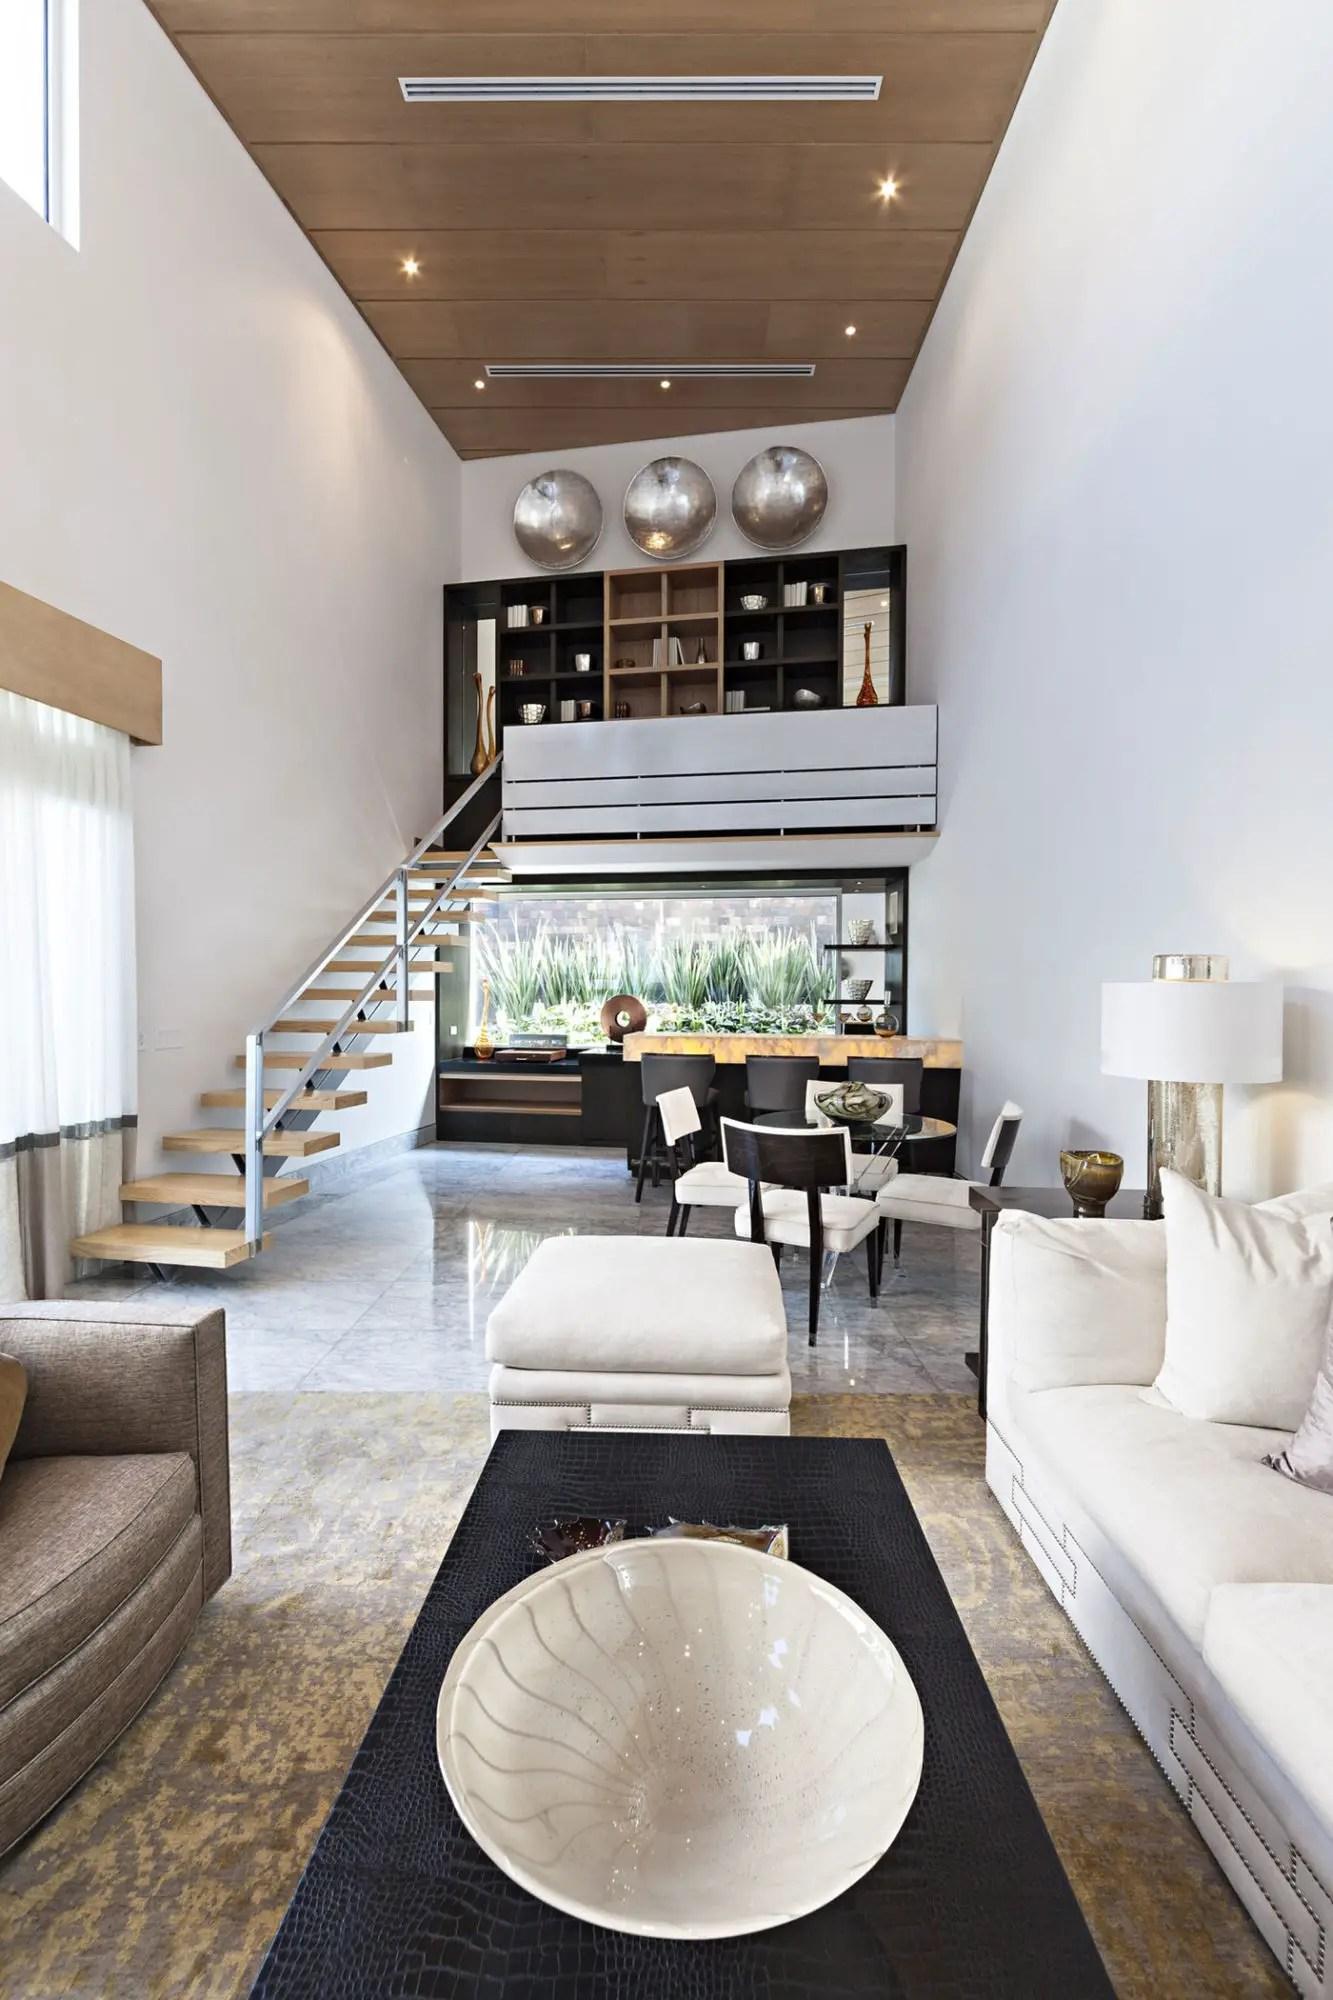 clean living room cape cod style house modern casa sorteo tec no. 191 in monterrey, méxico 14